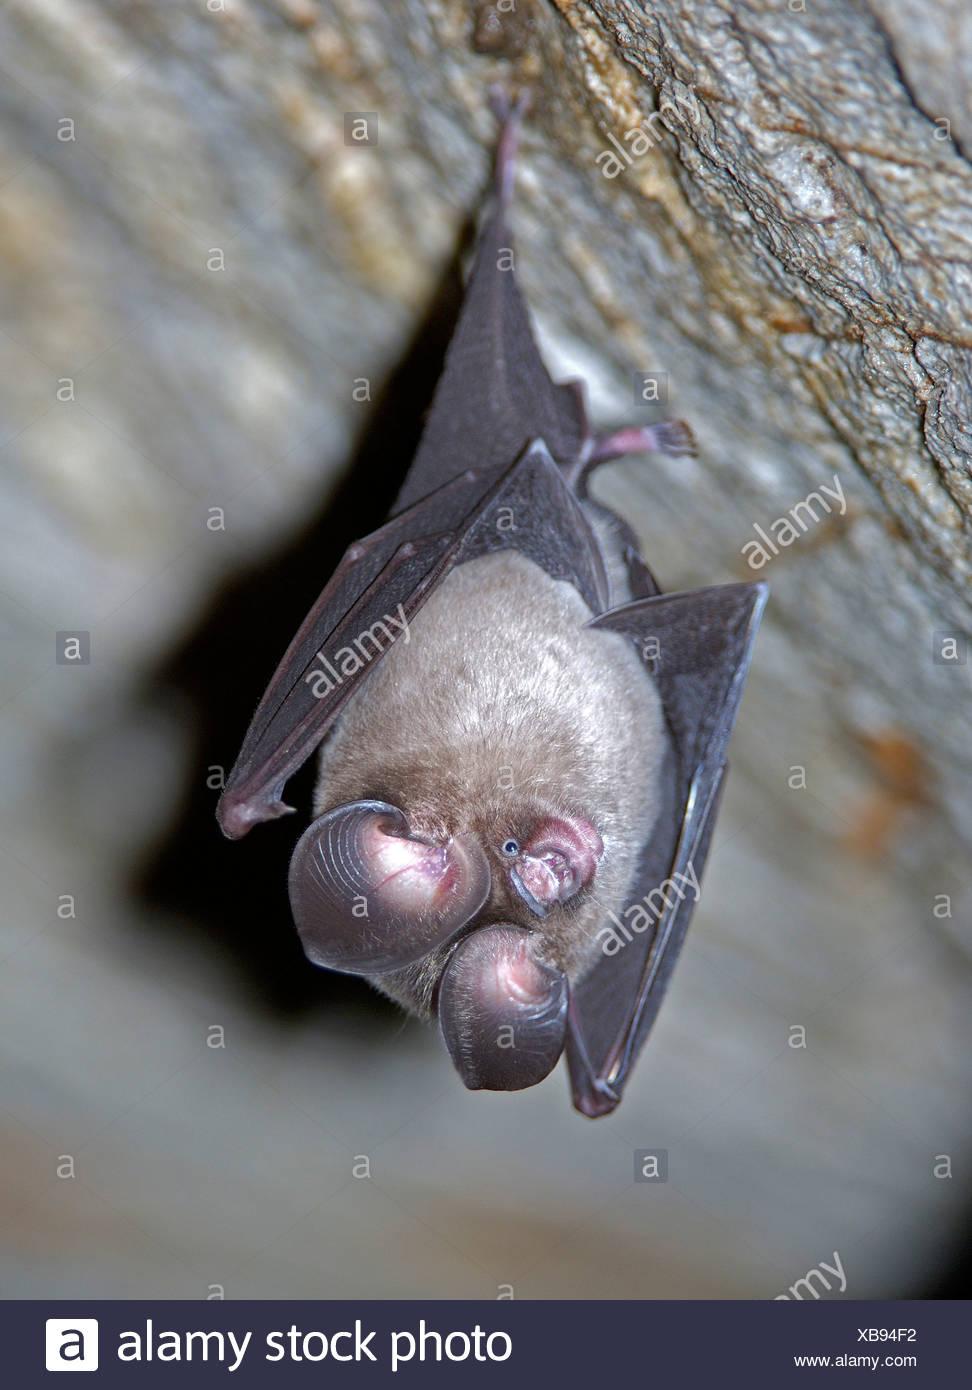 Vampire Bats Stock Photos & Vampire Bats Stock Images - Alamy